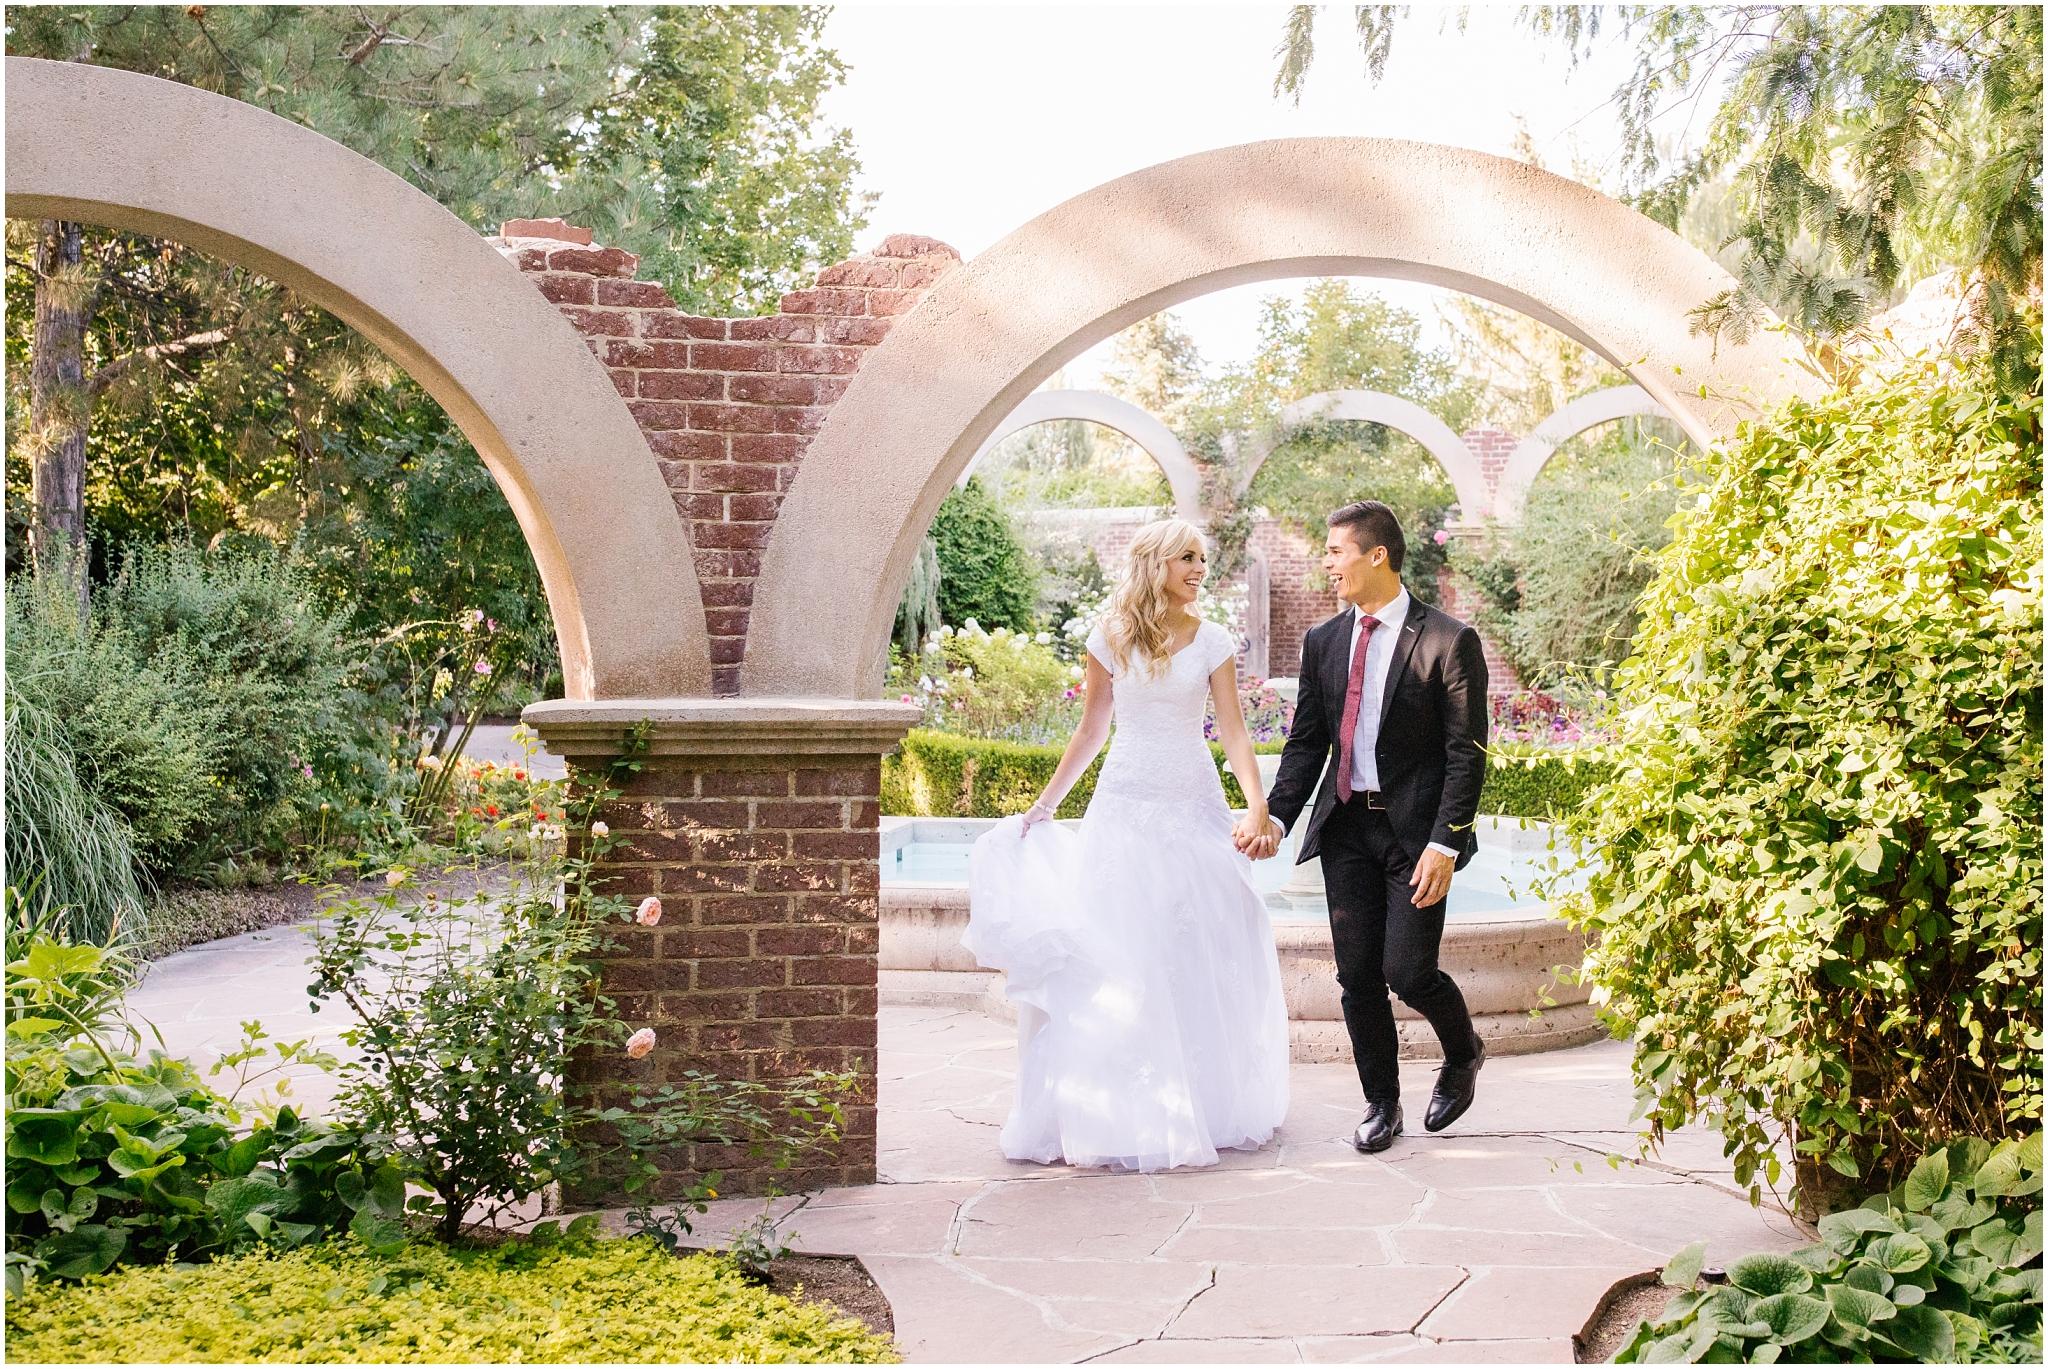 CHBridals-21_Lizzie-B-Imagery-Utah-Wedding-Photographer-Central-Utah-Park-City-Salt-Lake-City-Thanksgiving-Point-Bridals-Ashton-Gardens.jpg